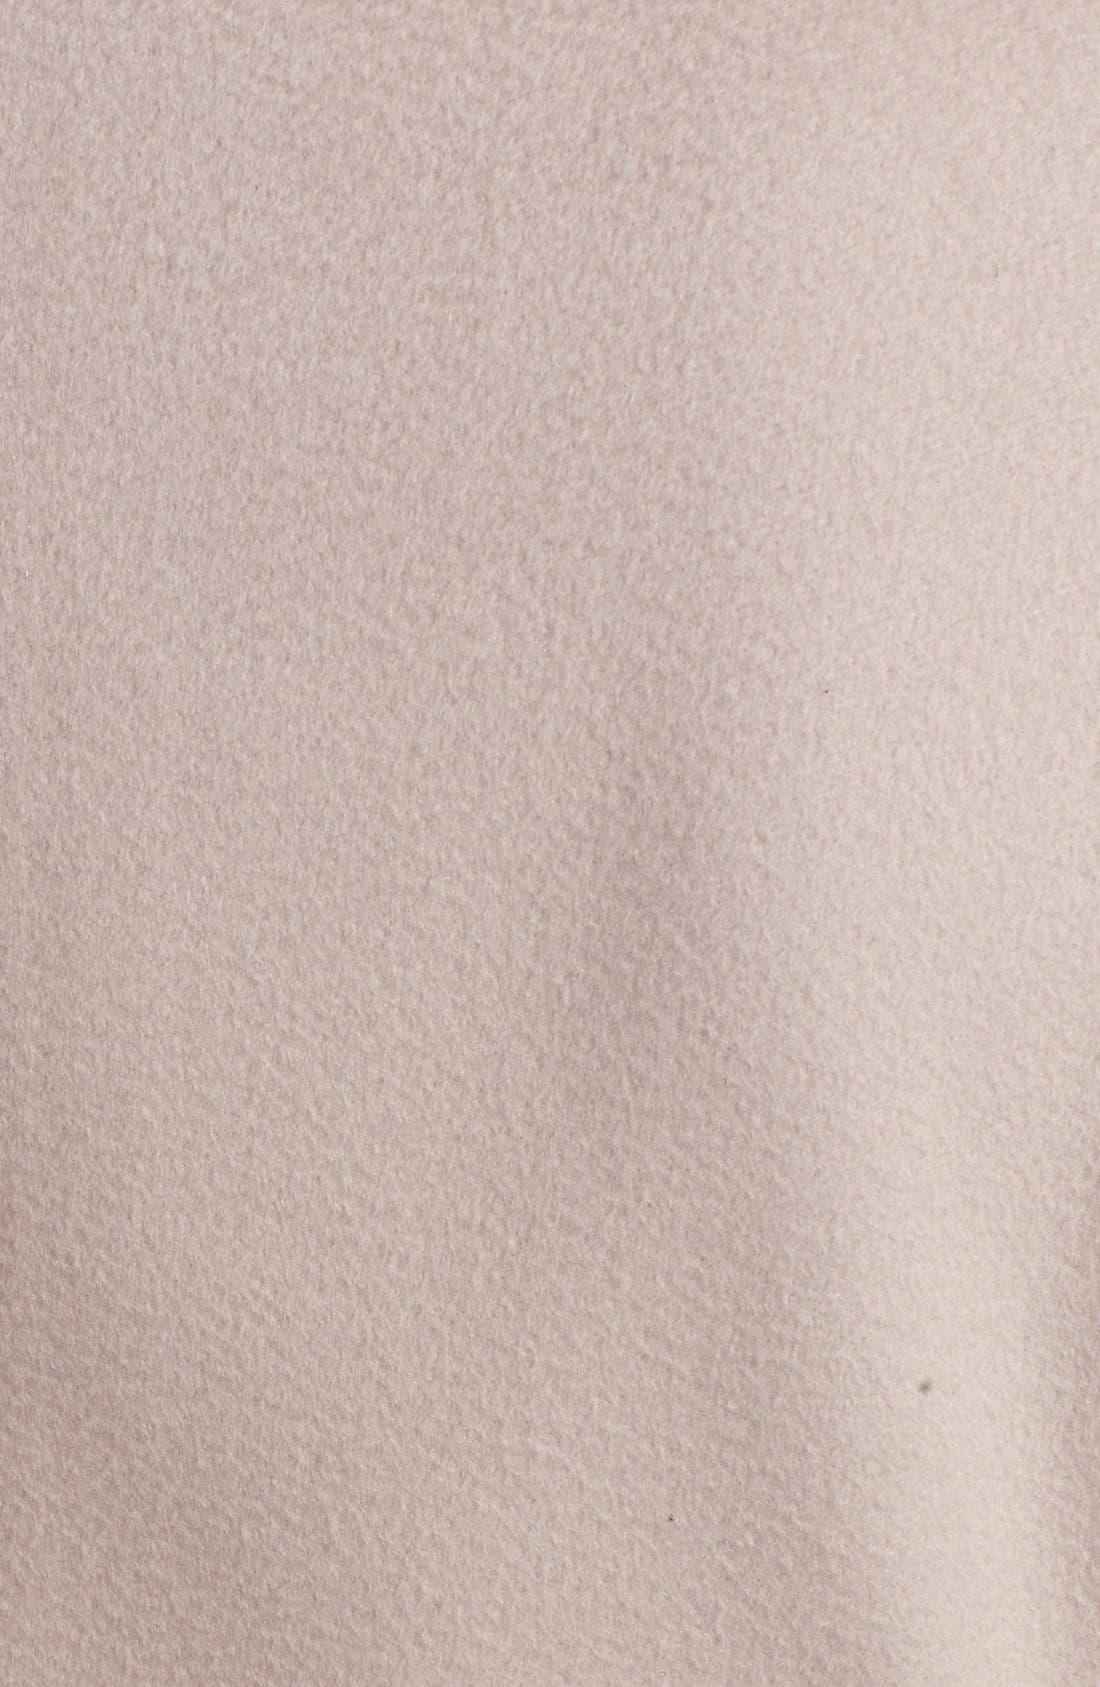 Alternate Image 3  - BOSS HUGO BOSS 'Camilla' Wool Coat